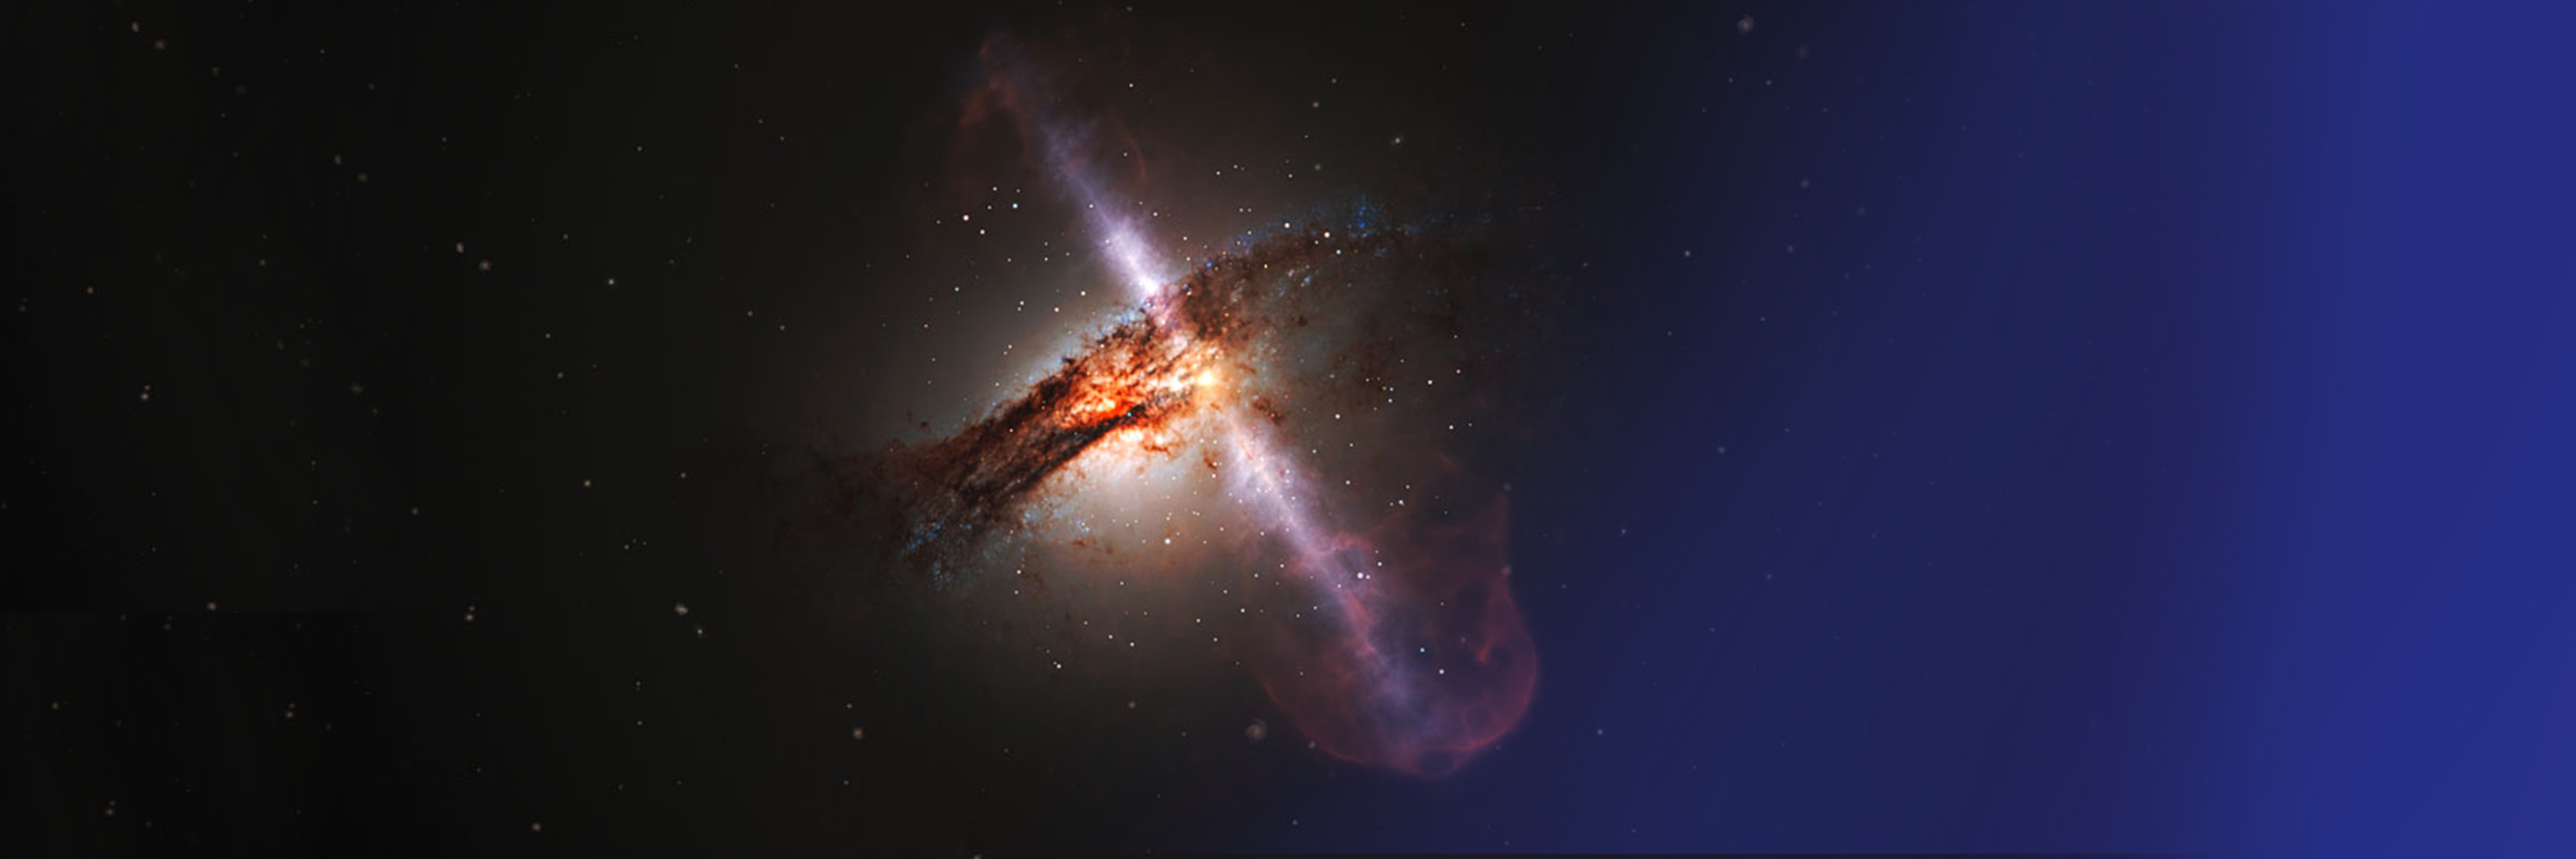 University Of Kentucky Majors >> Supermassive Black Holes Do Not Form from Stellar Black ...